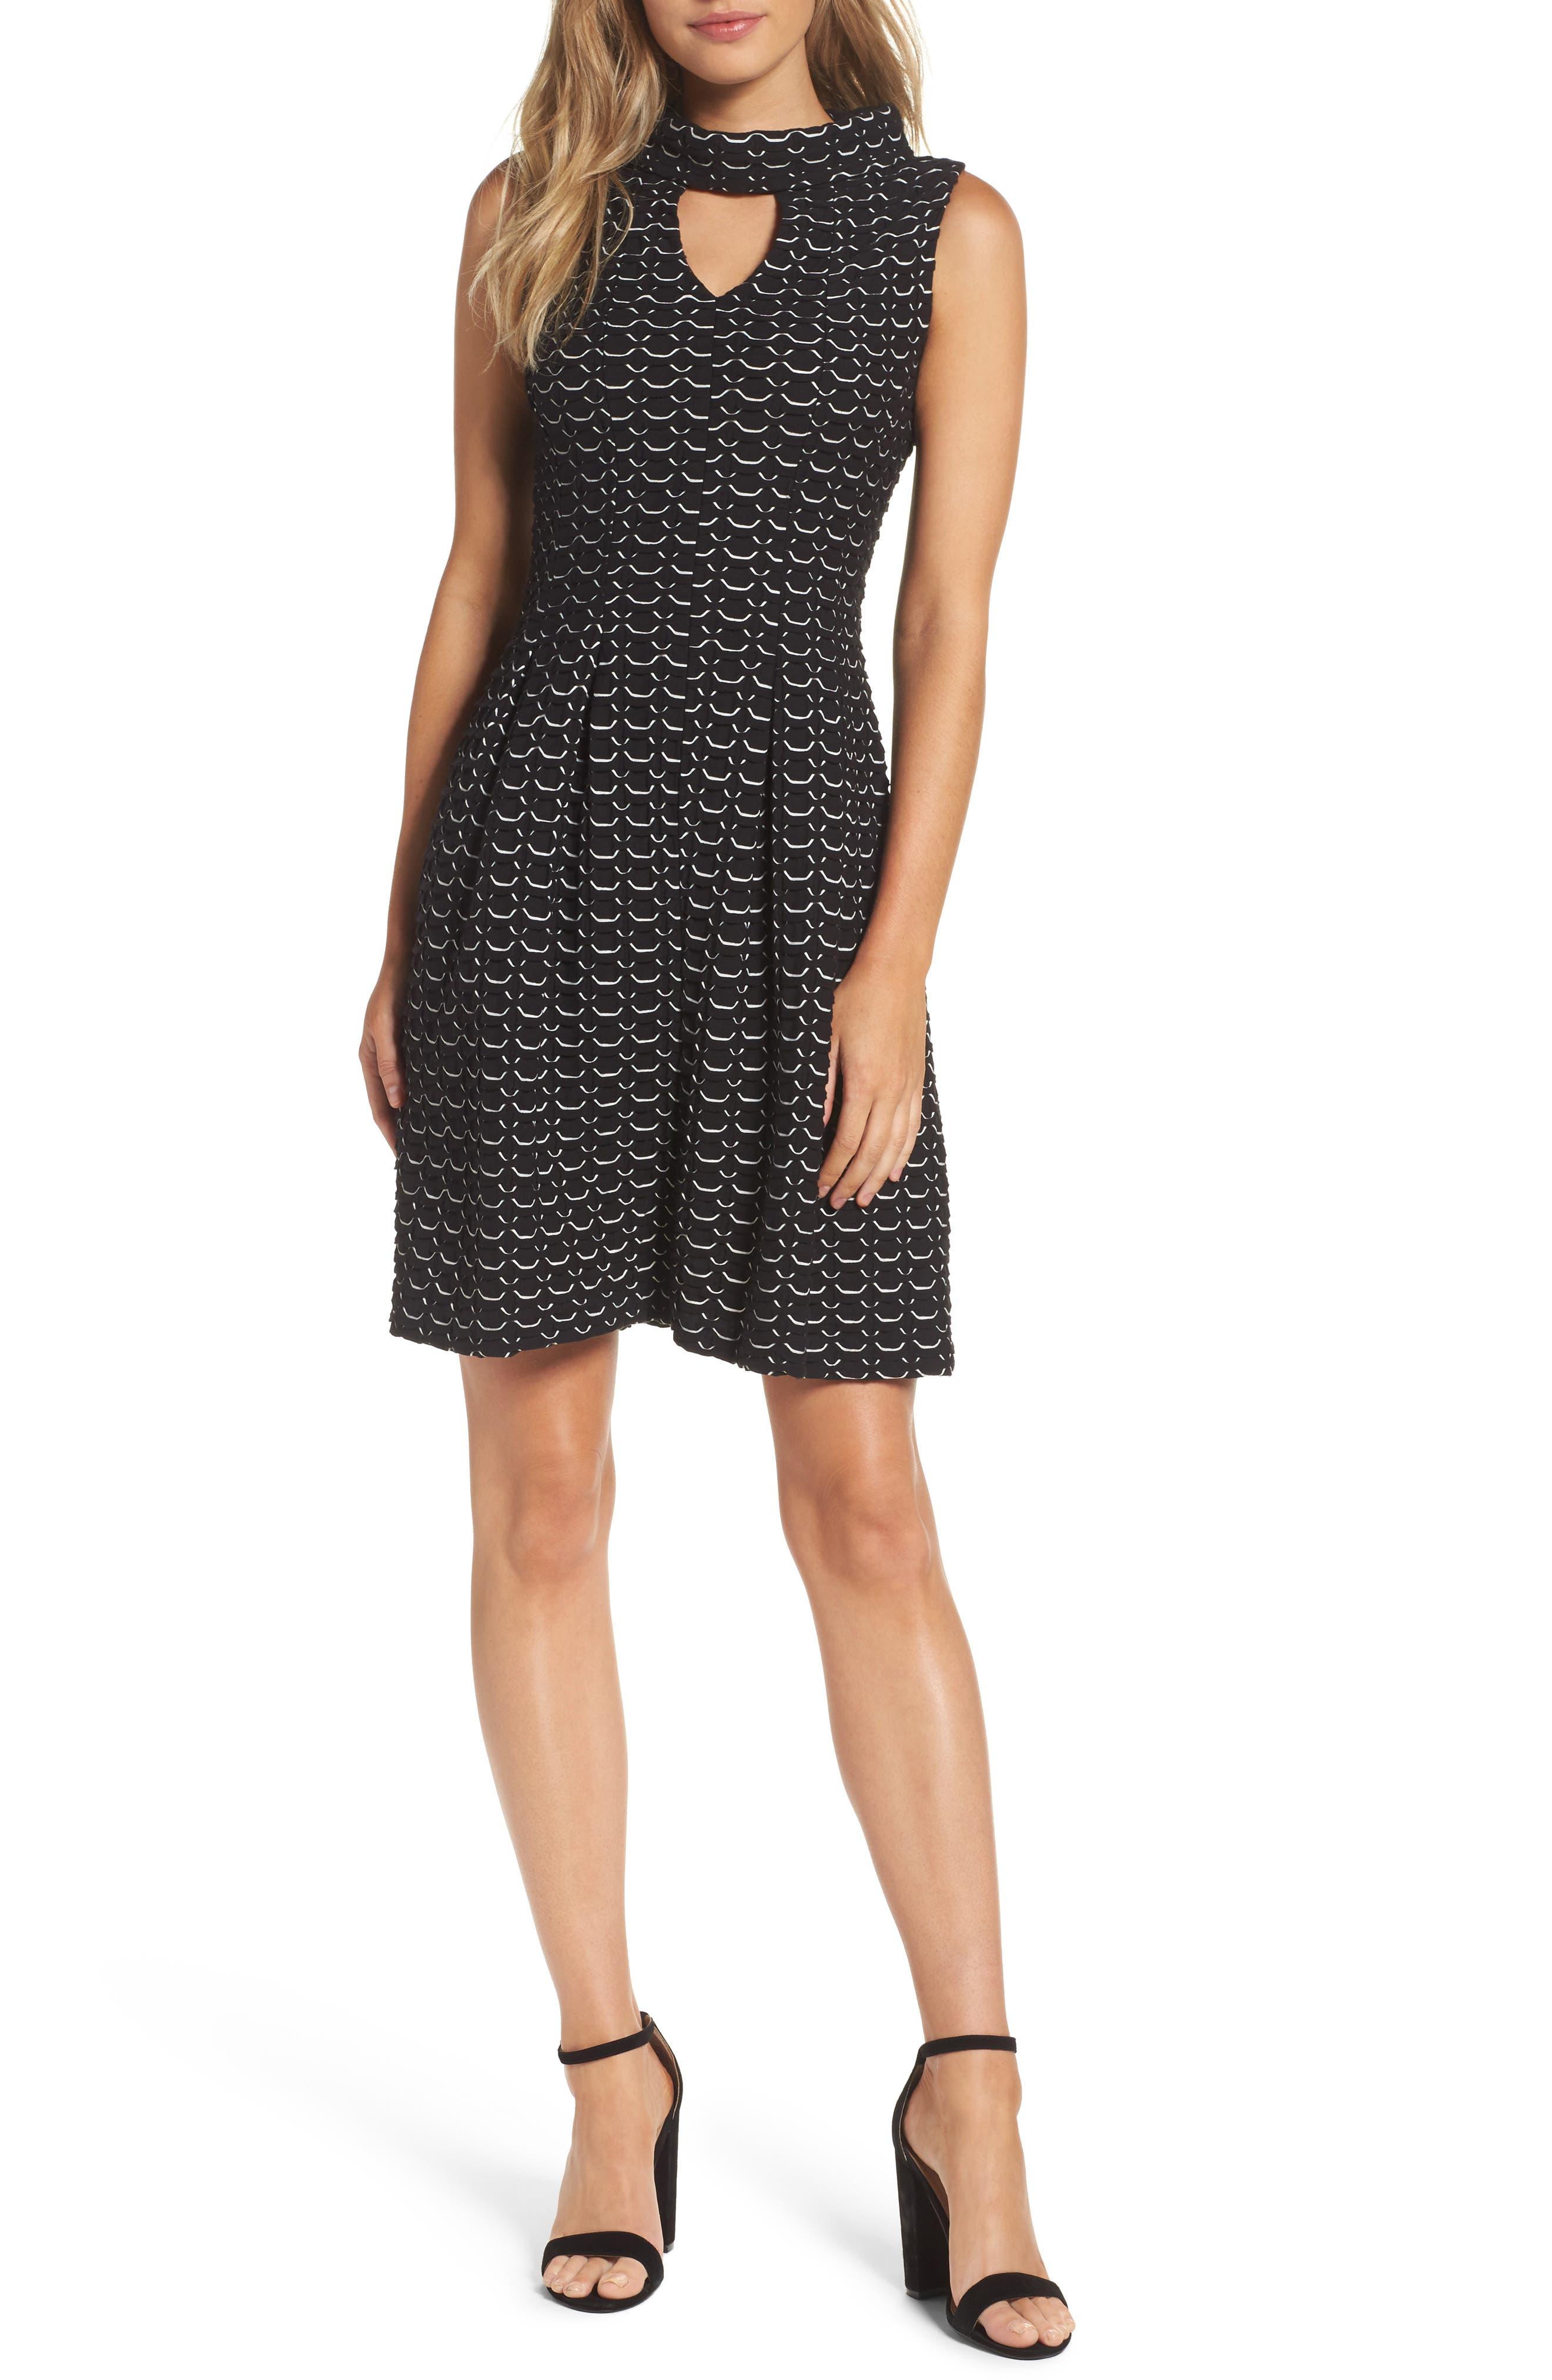 TAYLOR DRESSES Textured Knit Fit & Flare Dress